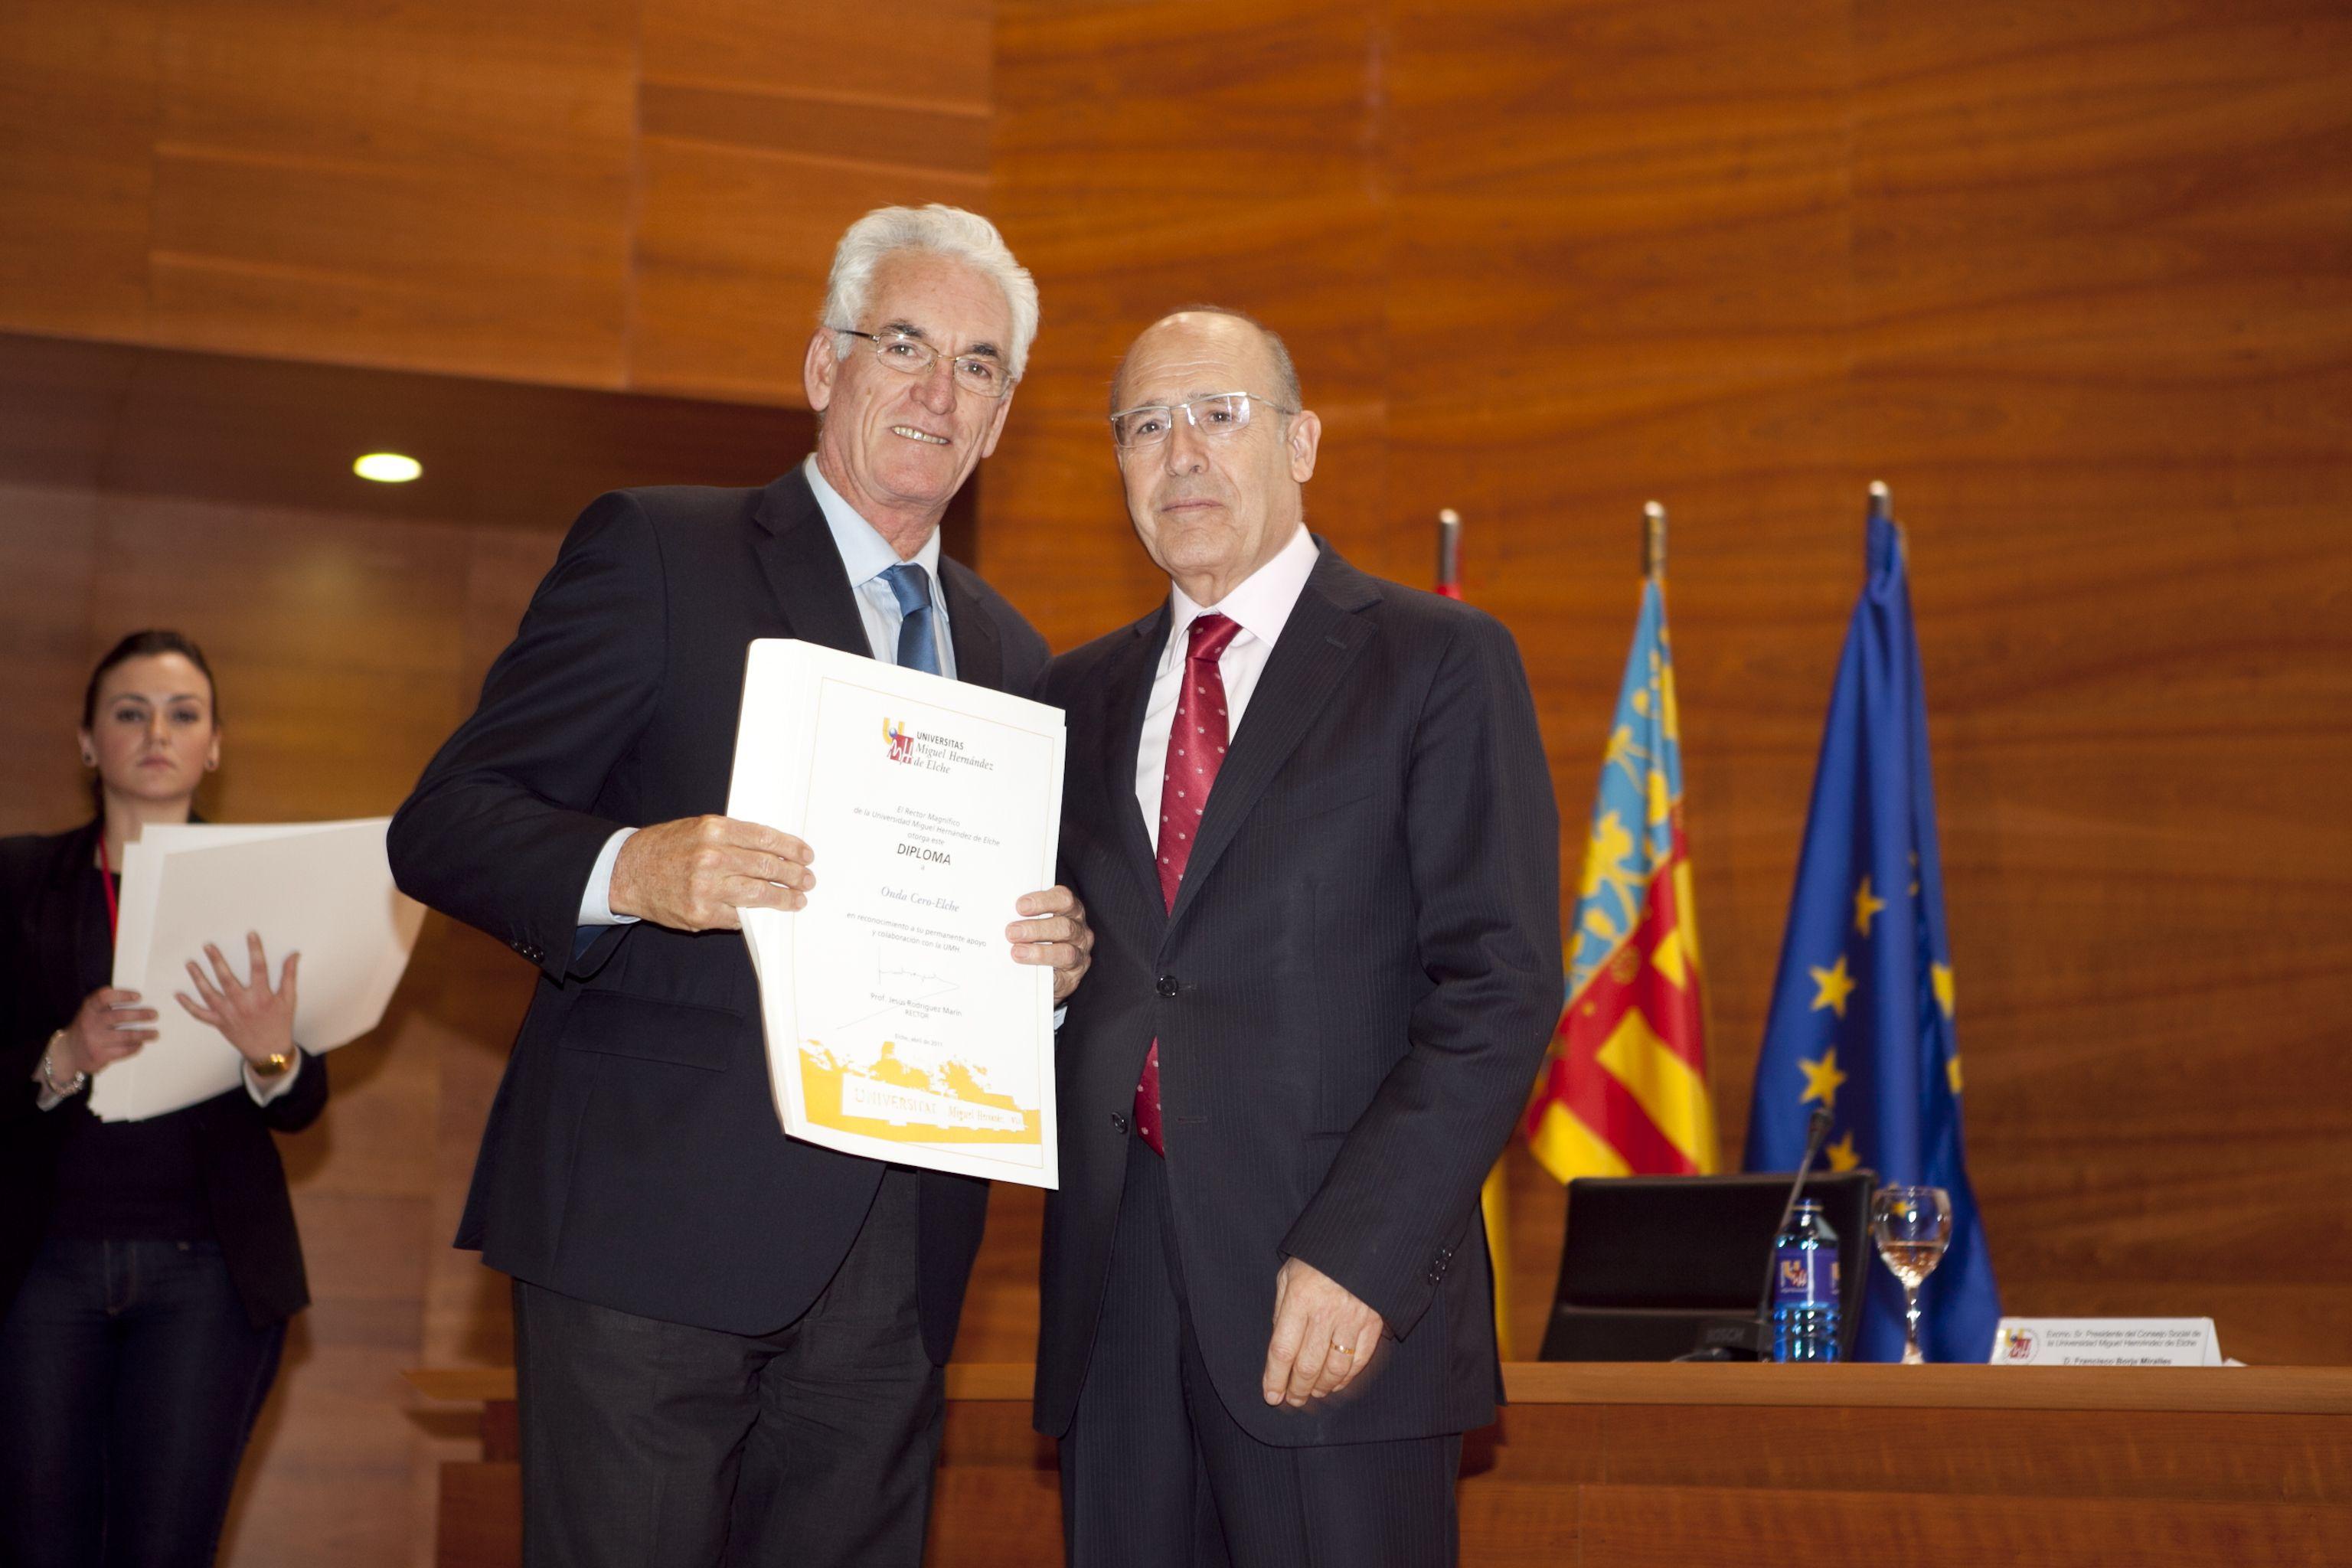 umh-diplomas-rector_mg_6872.jpg